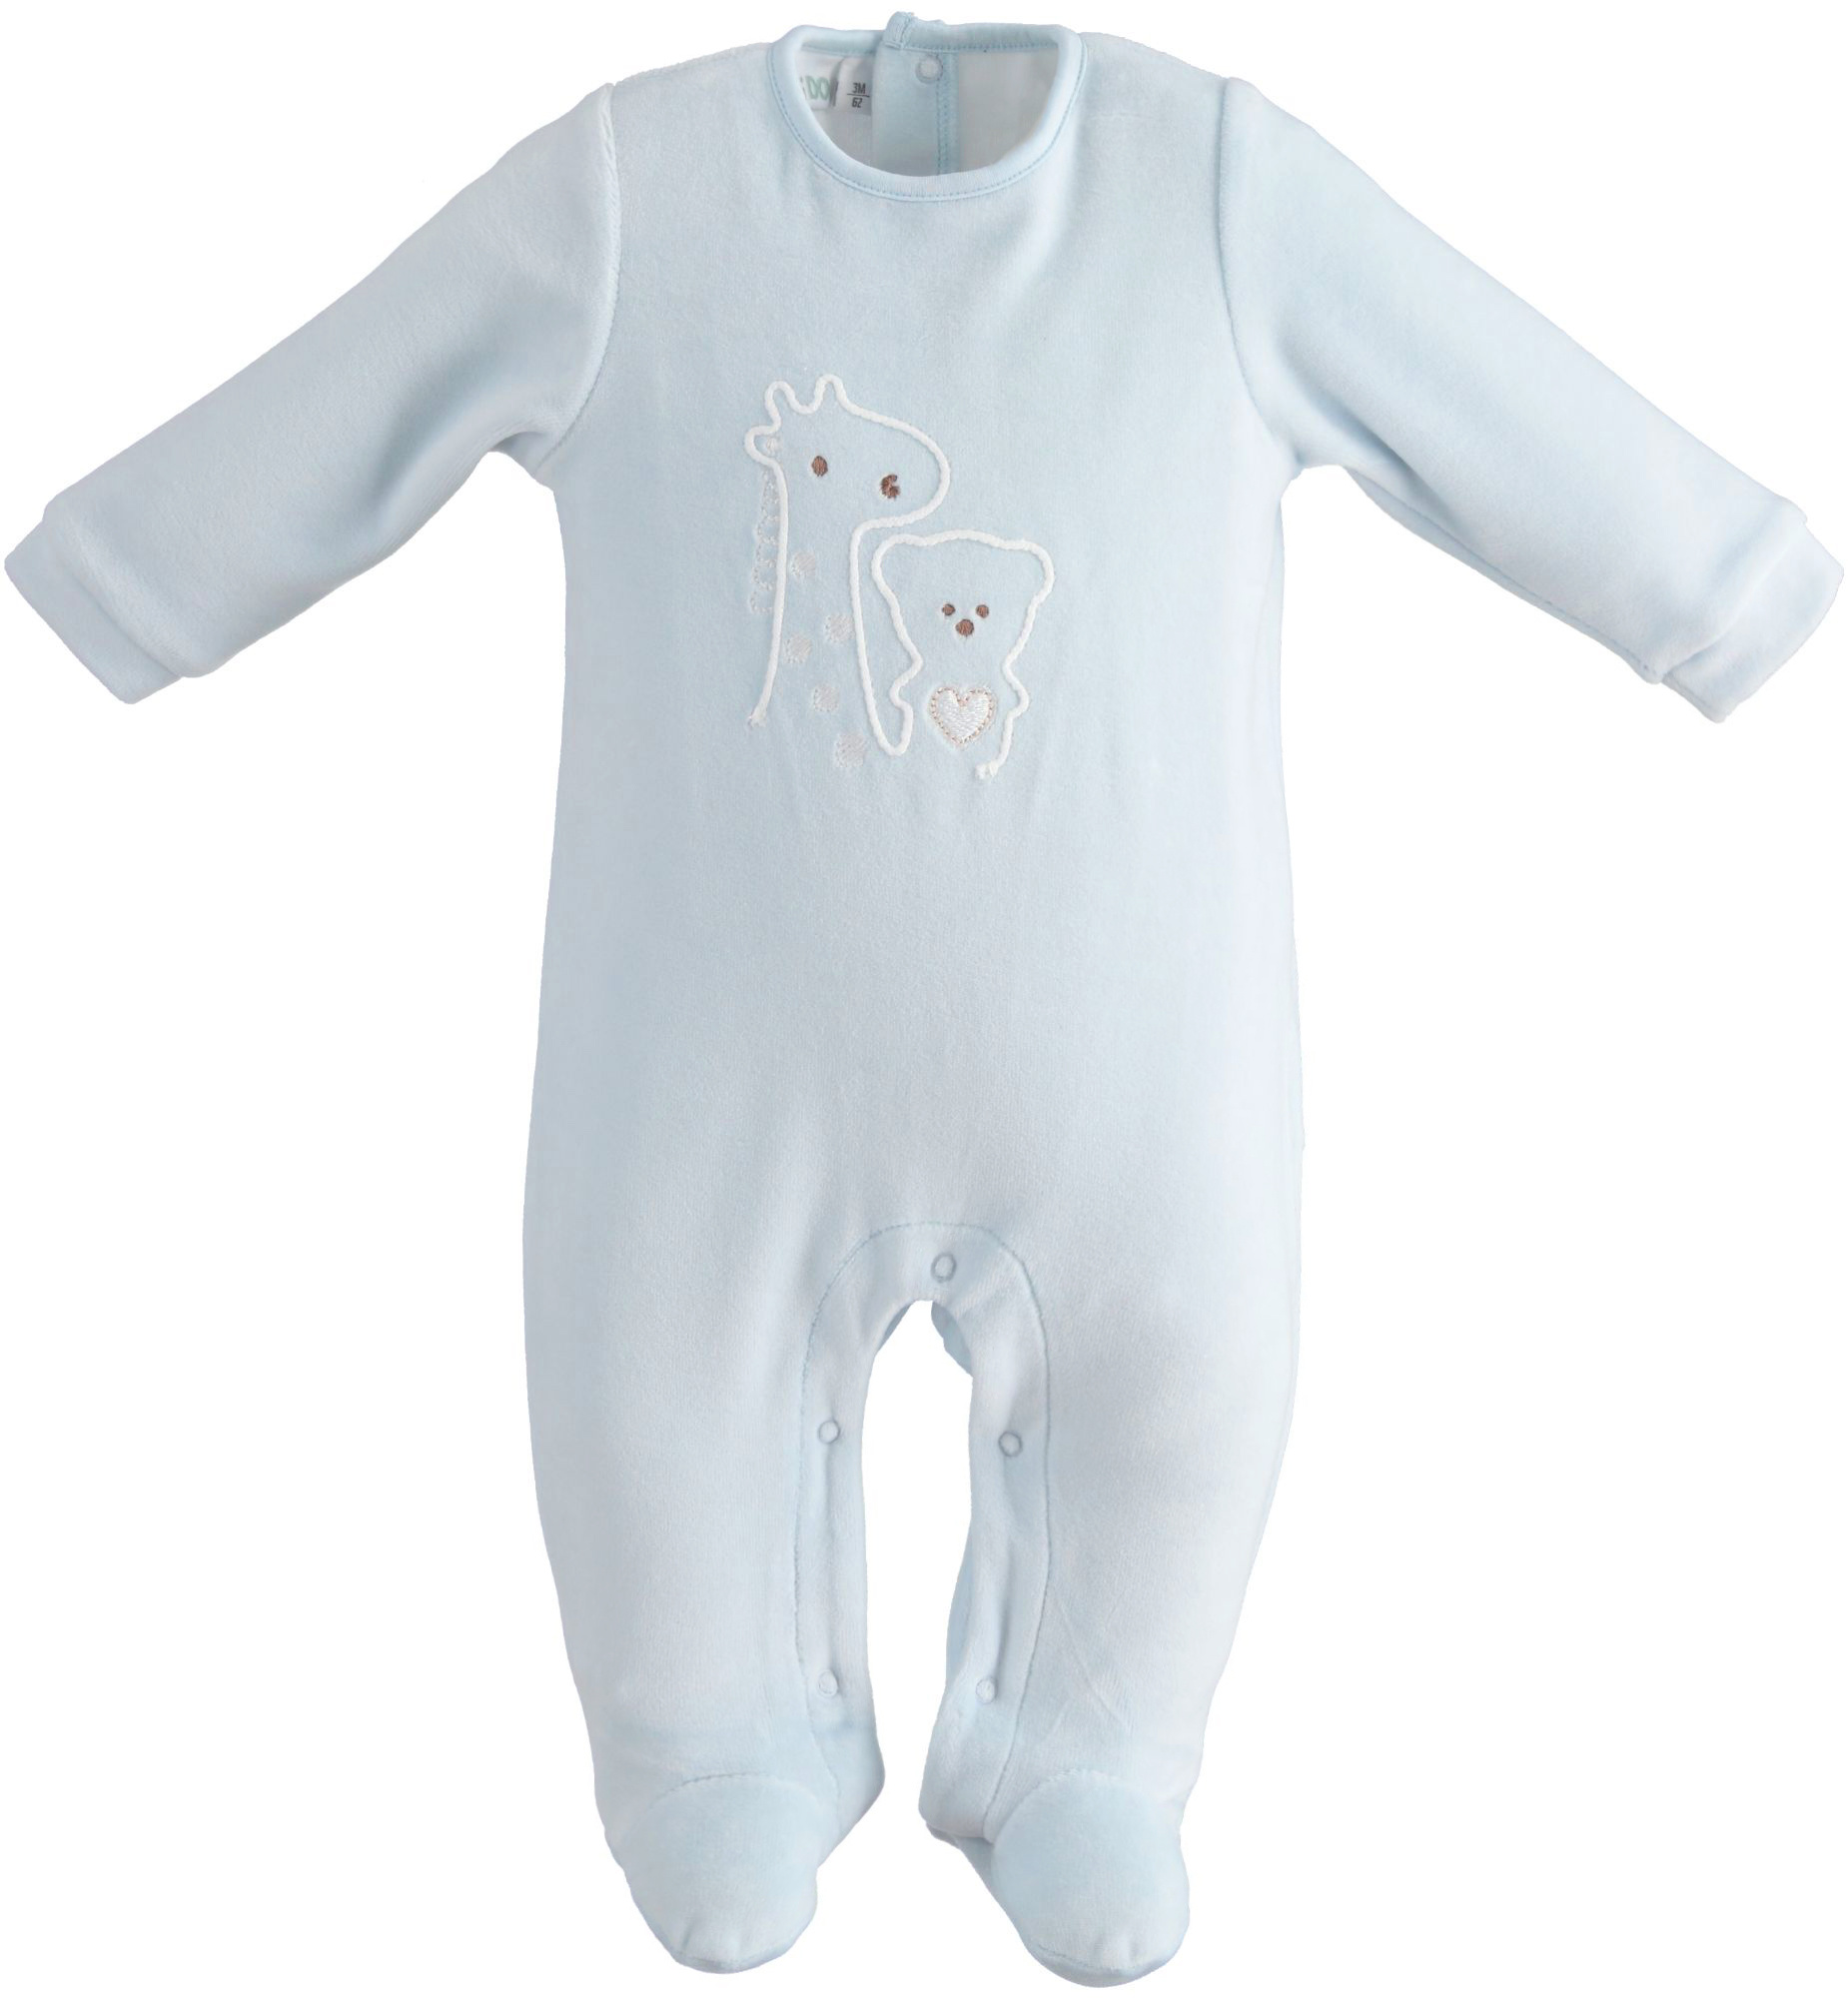 Ido Ido Giraffe Velour Babygrow 2183 S21